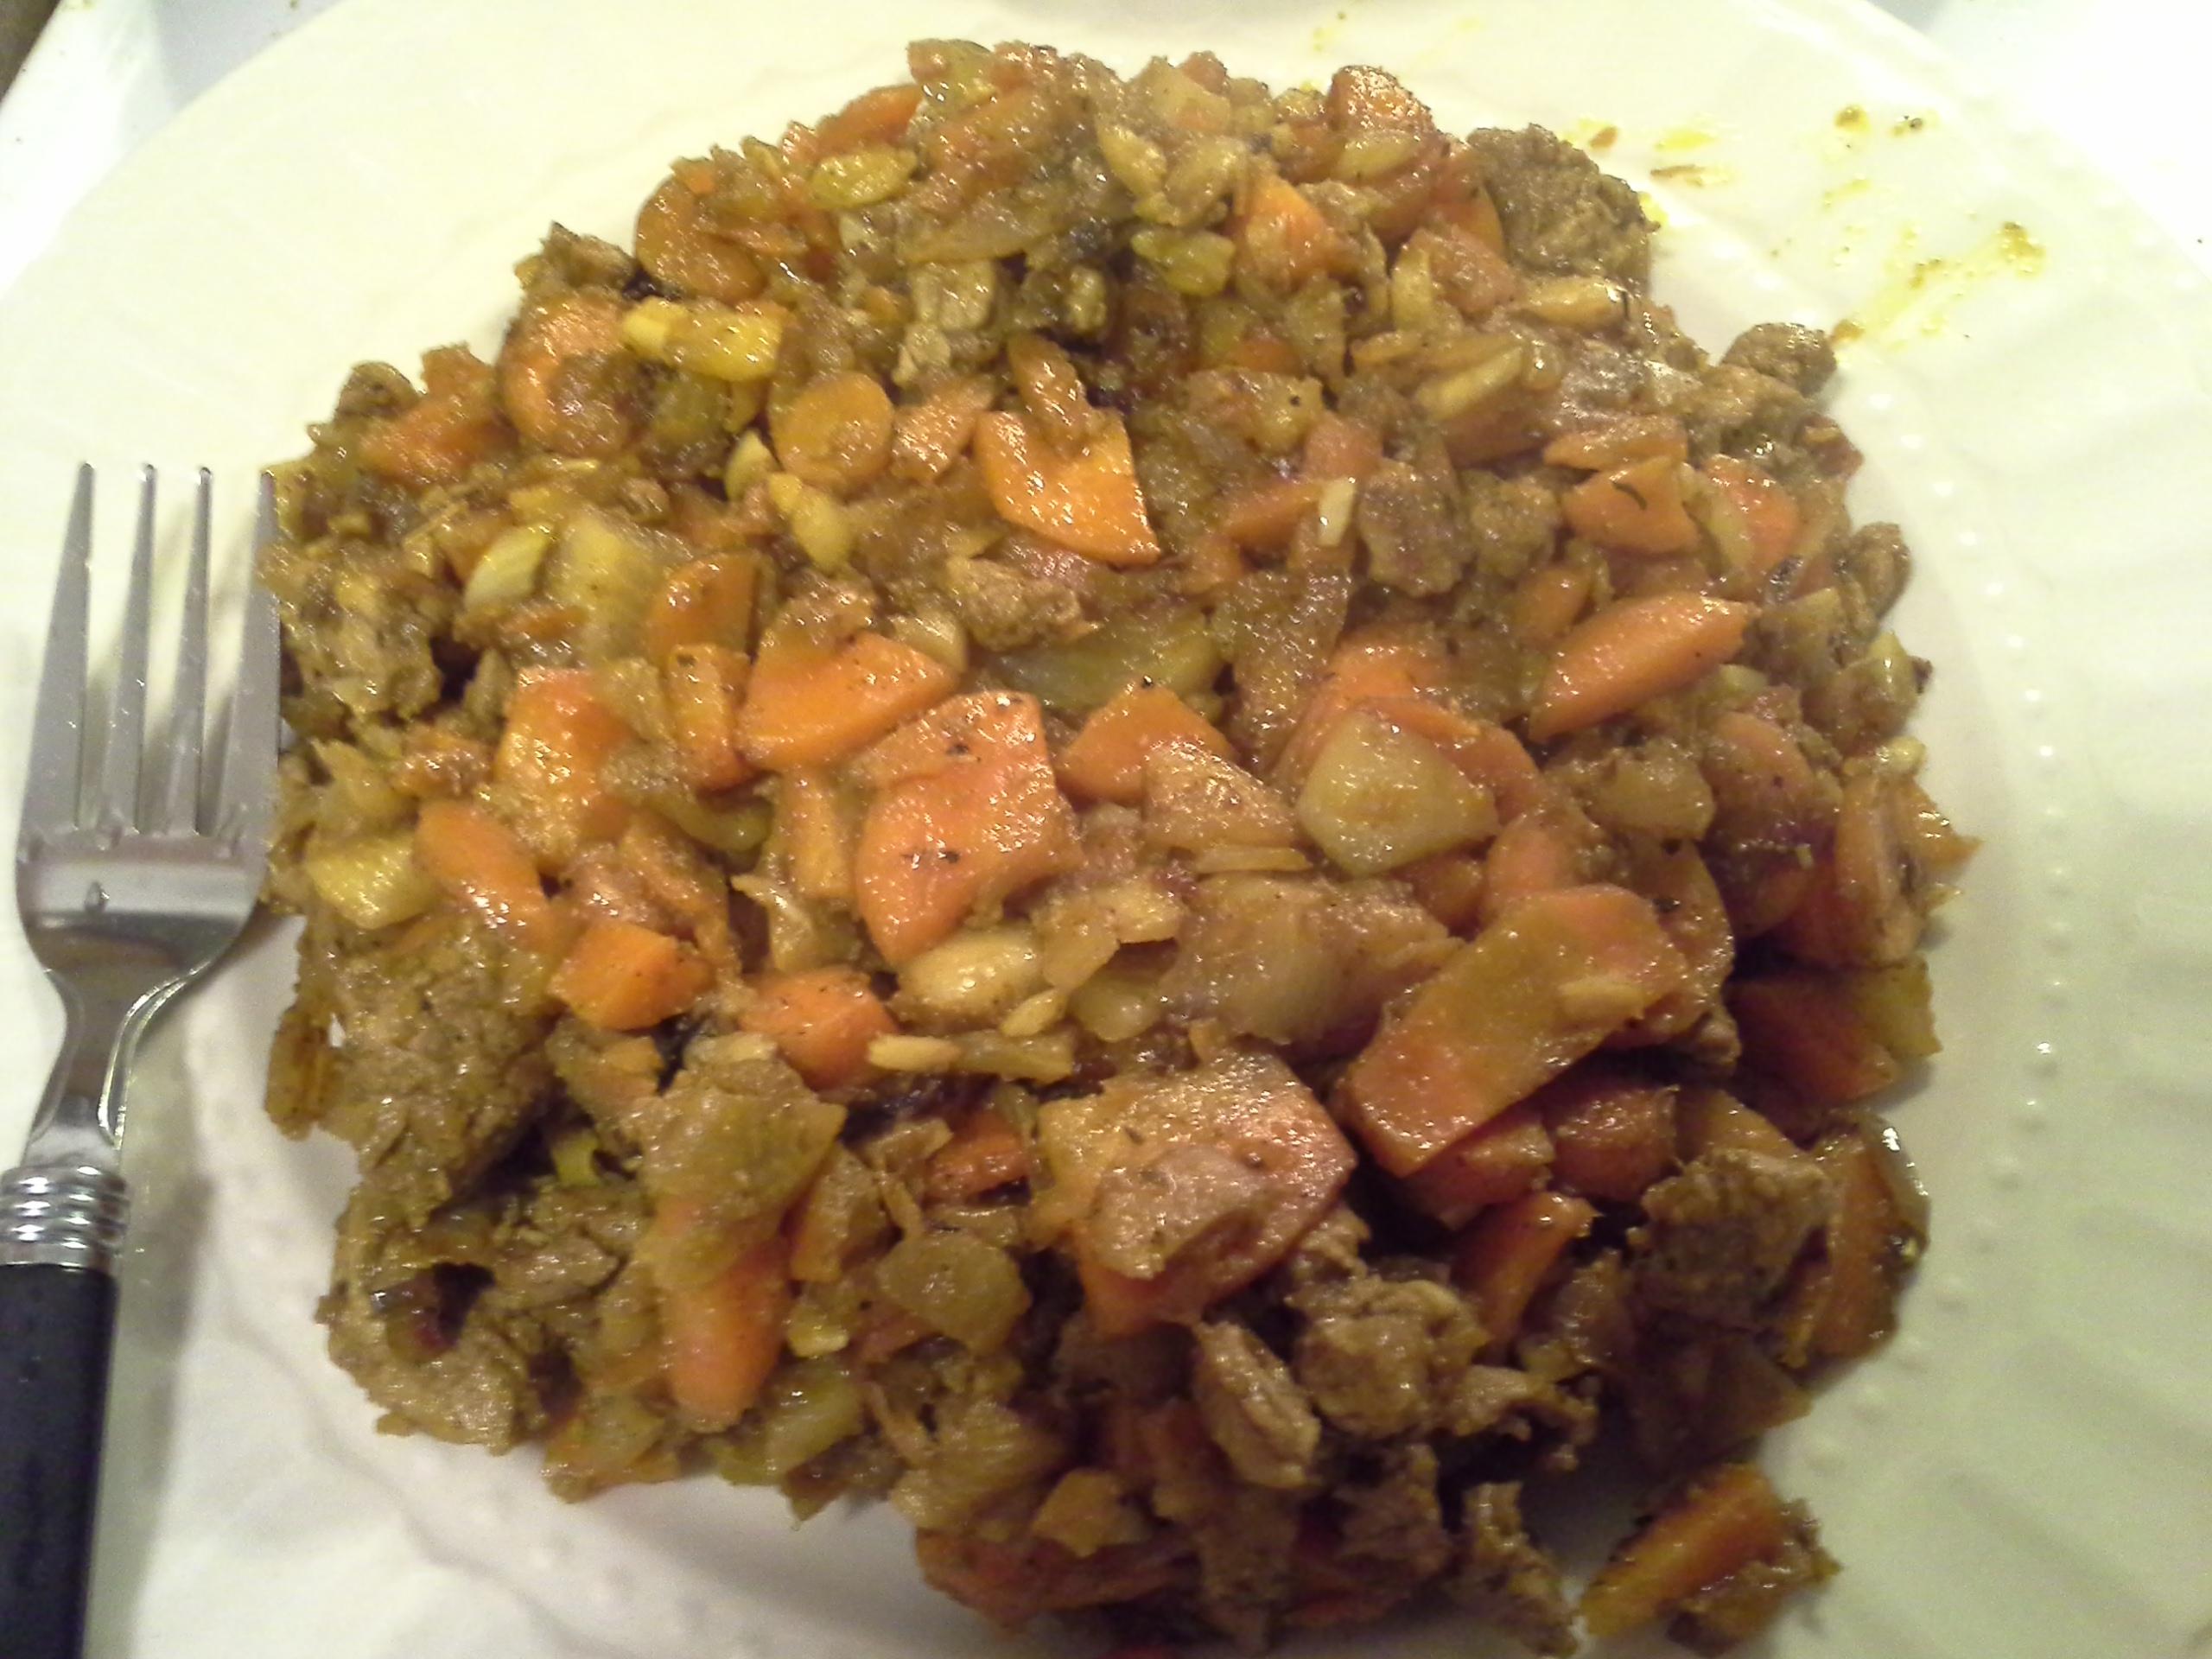 Dinner: 9:40 p.m.   1/2 pork loin, 2 carrots, 1/2 rutabaga, 1/2 yellow onion, 4 cloves garlic, 2 Tbsp. red palm oil, herbs & spices